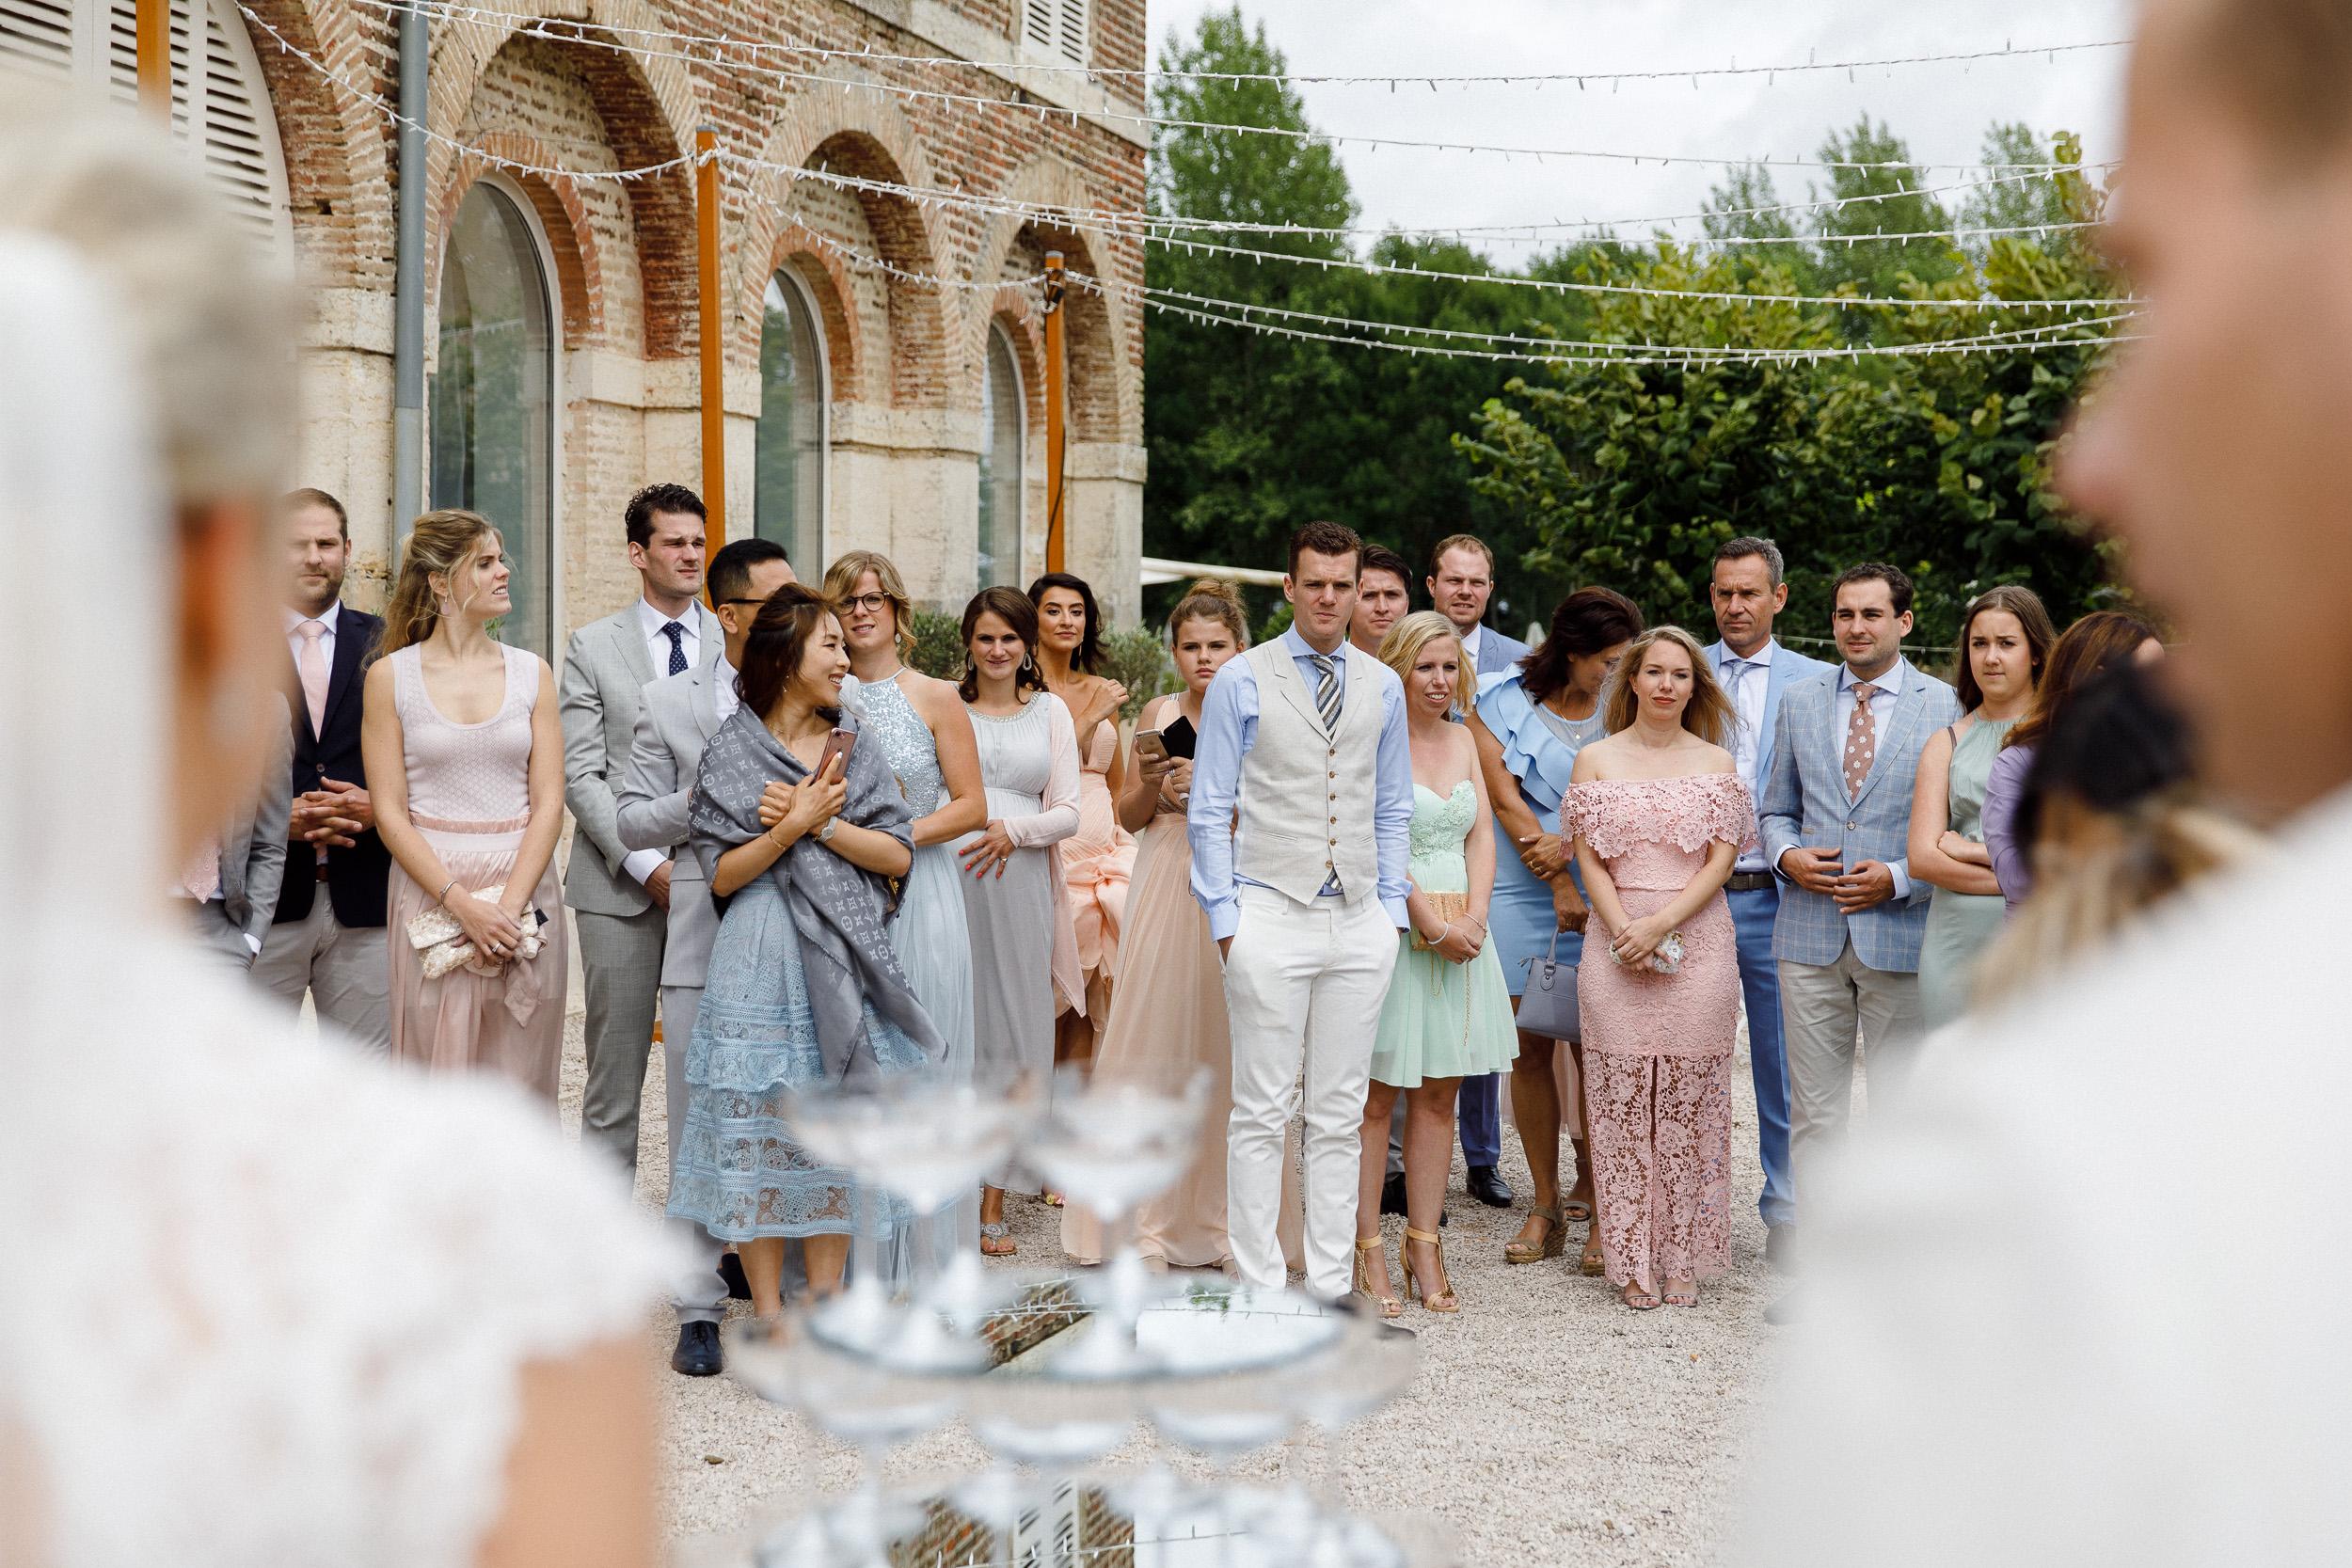 Wedding-Chateau-de-Varennes-057.jpg